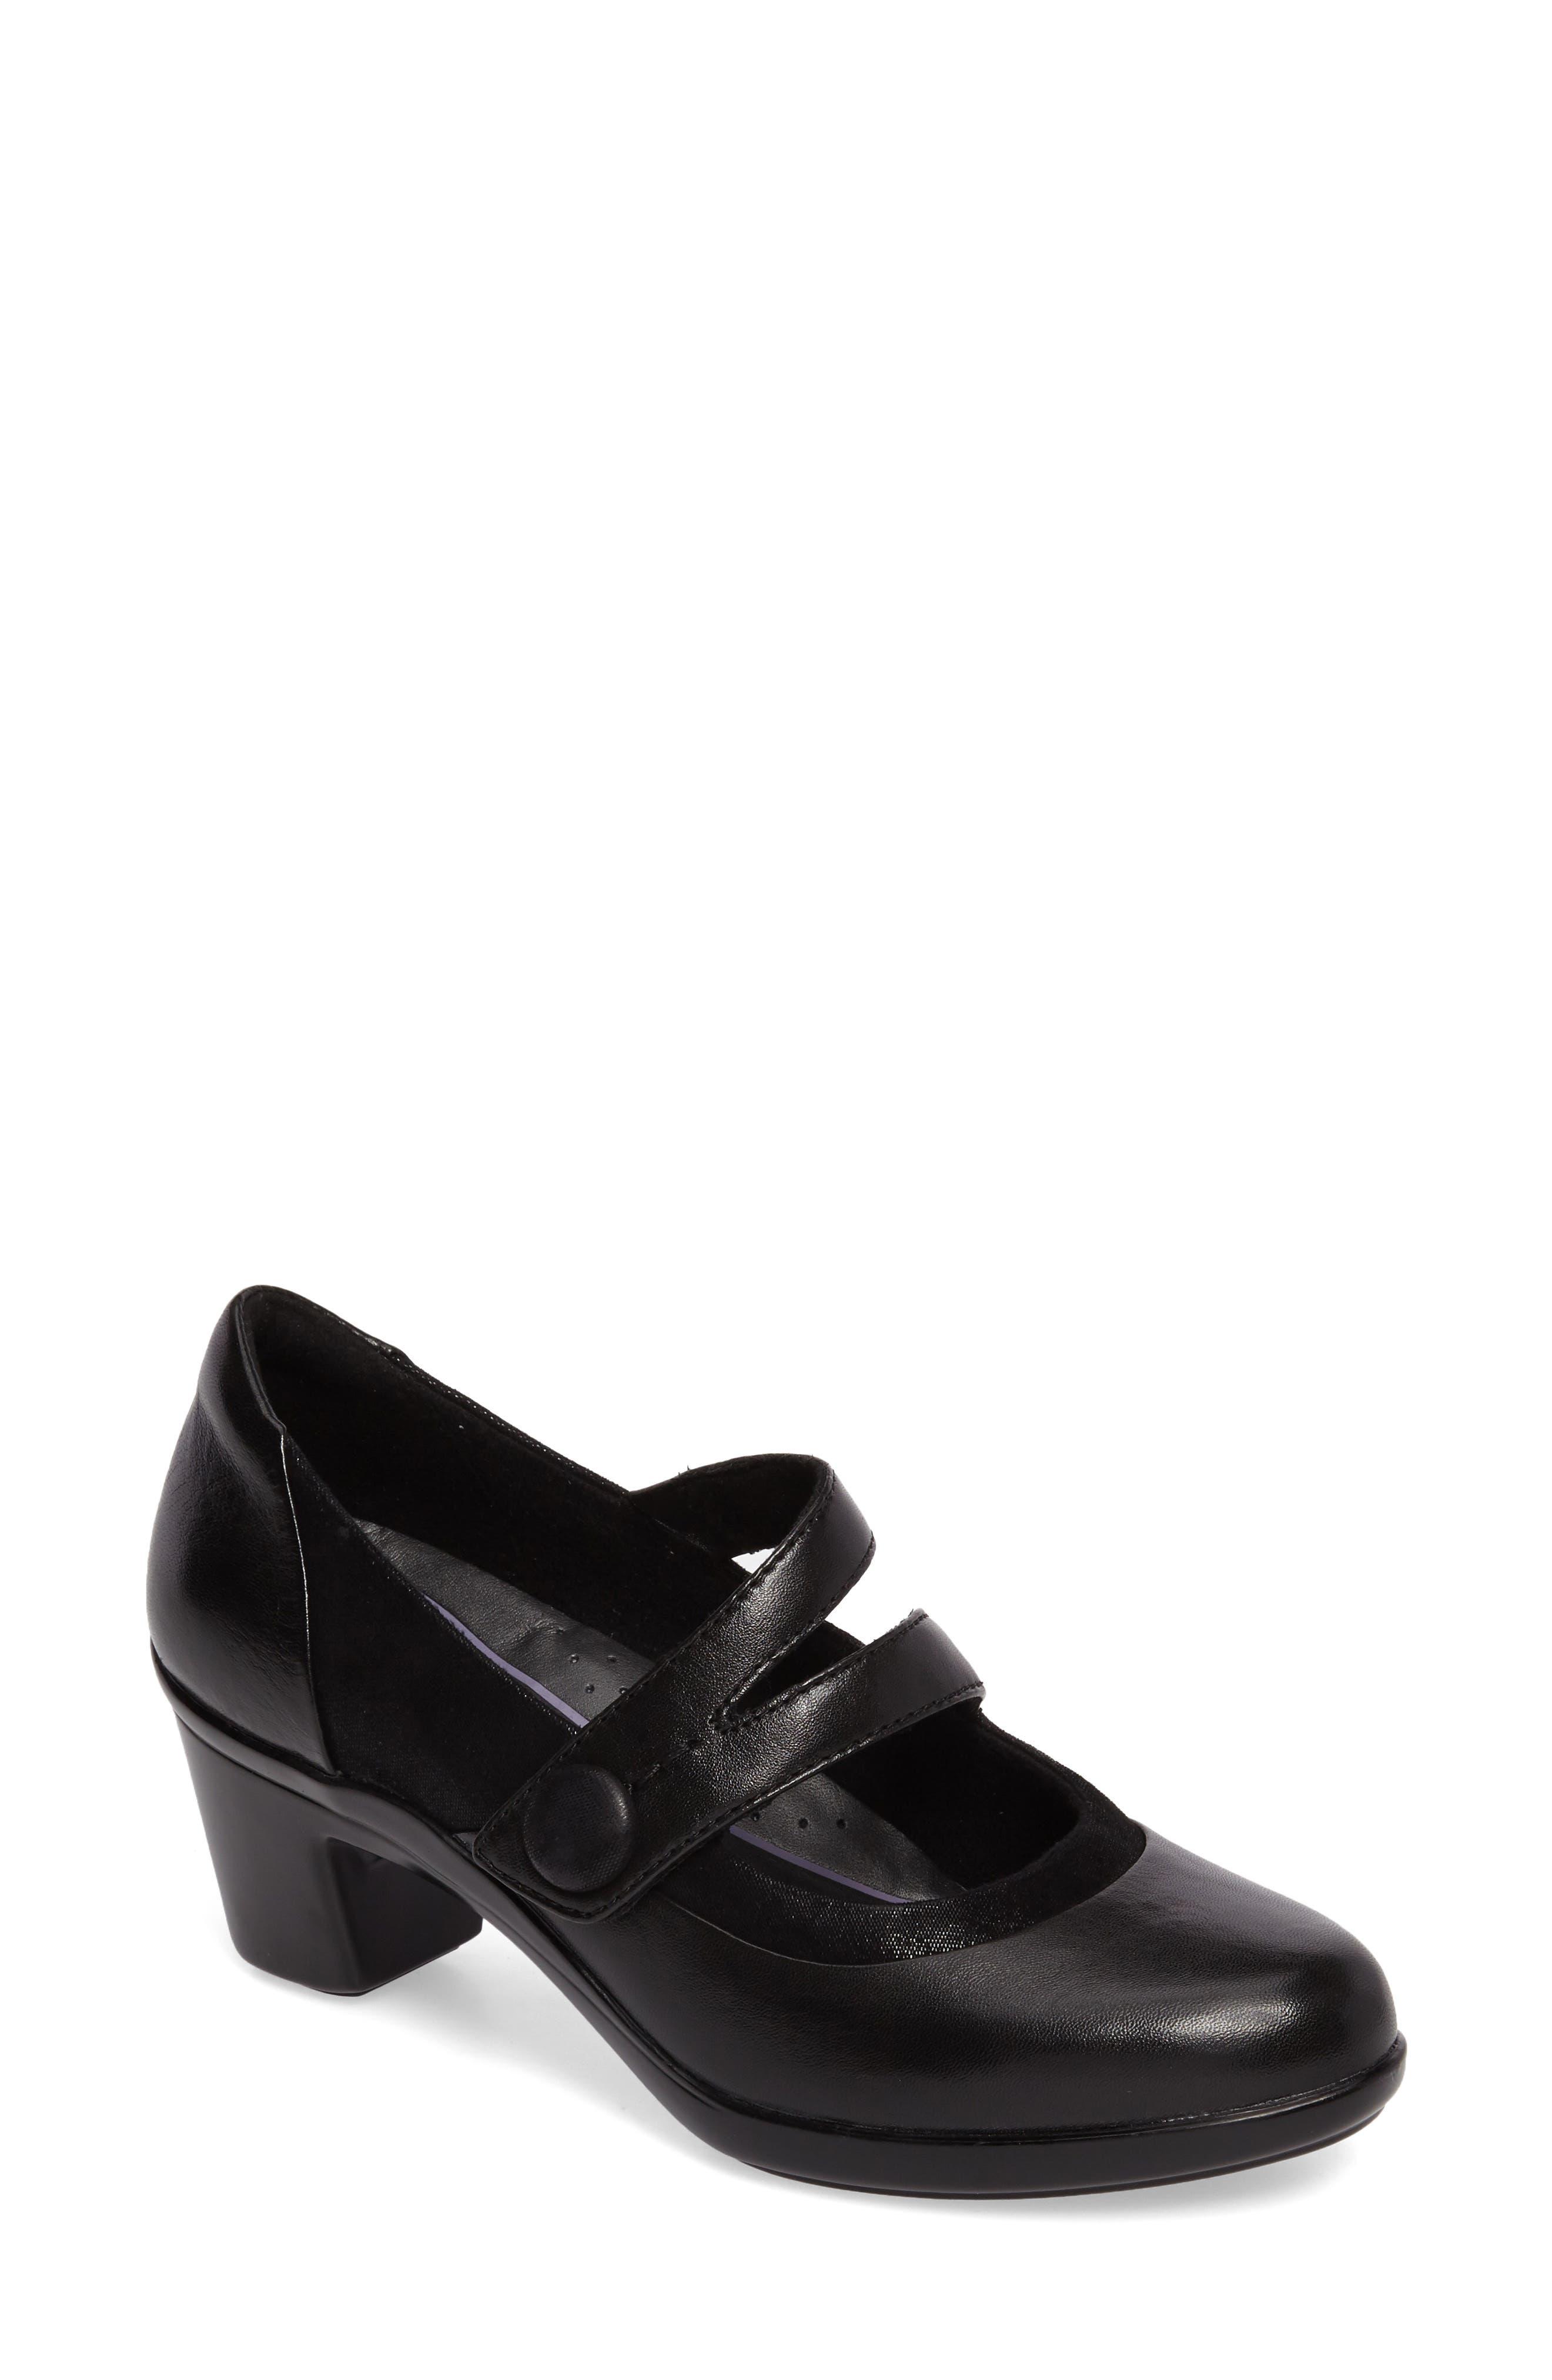 Lexee Mary Jane Pump,                             Main thumbnail 1, color,                             Black Leather